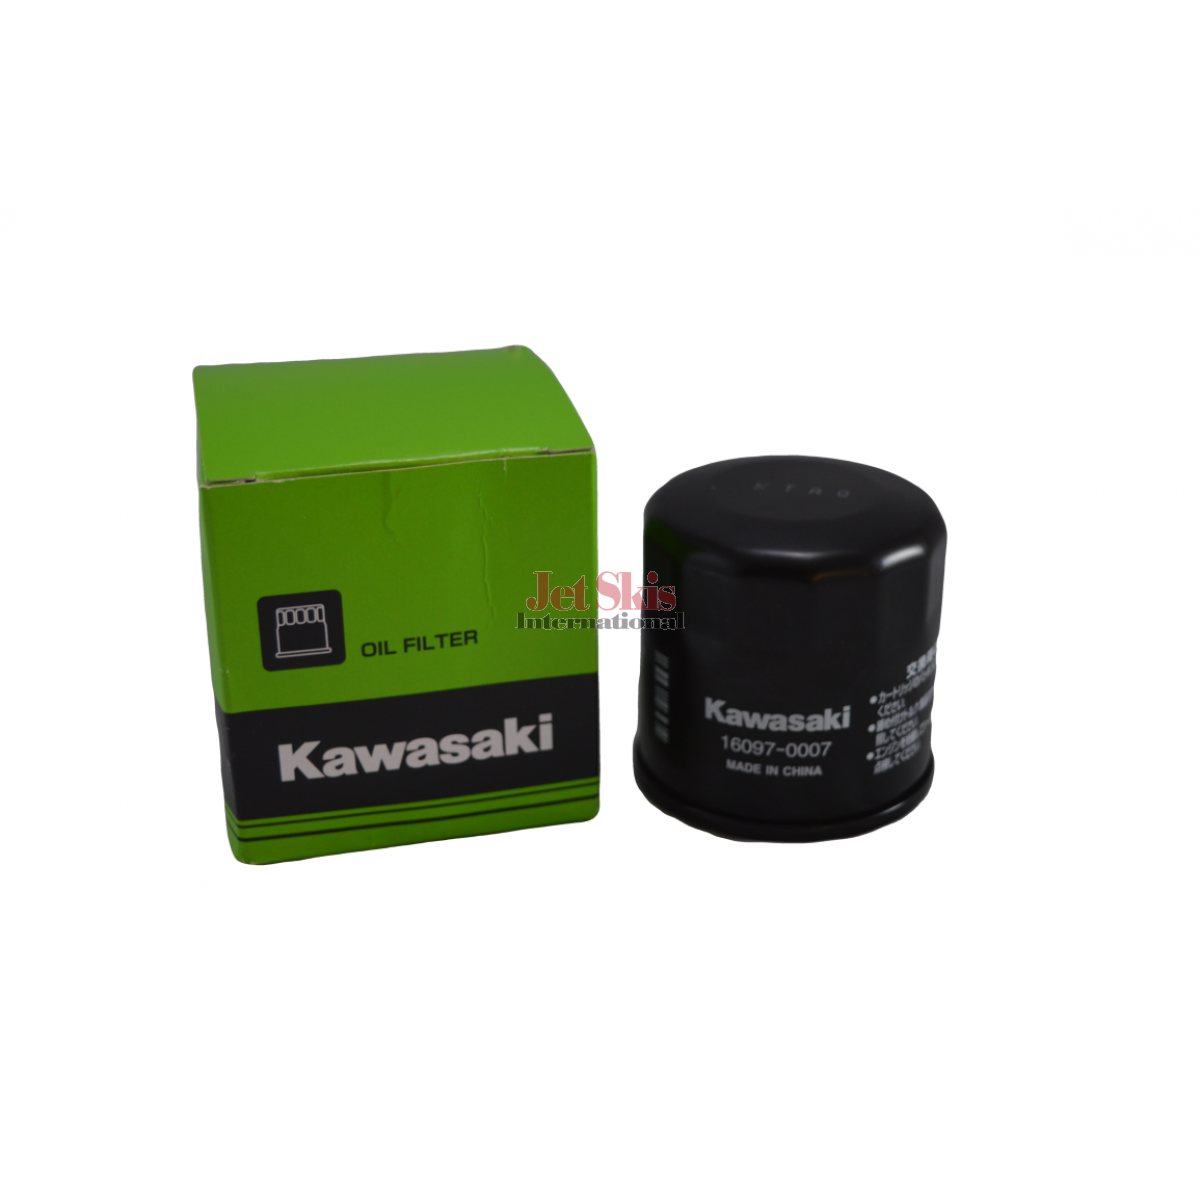 Kawasaki Zoil Filter